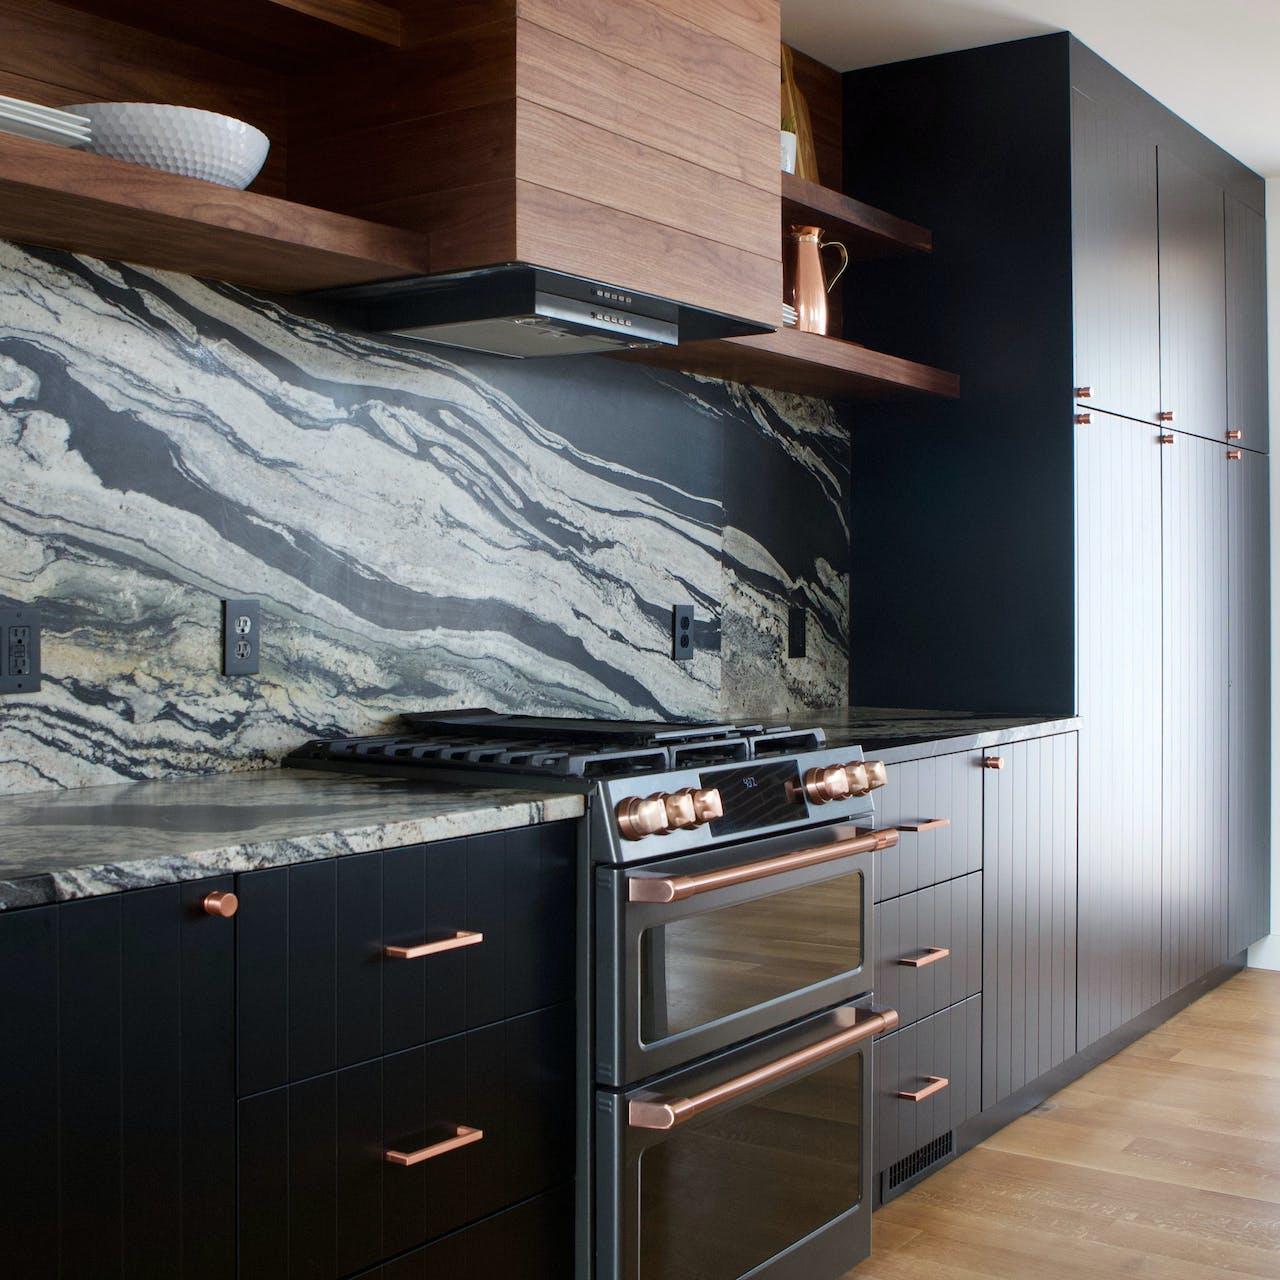 Café matte black appliances in semihandmade cabinets